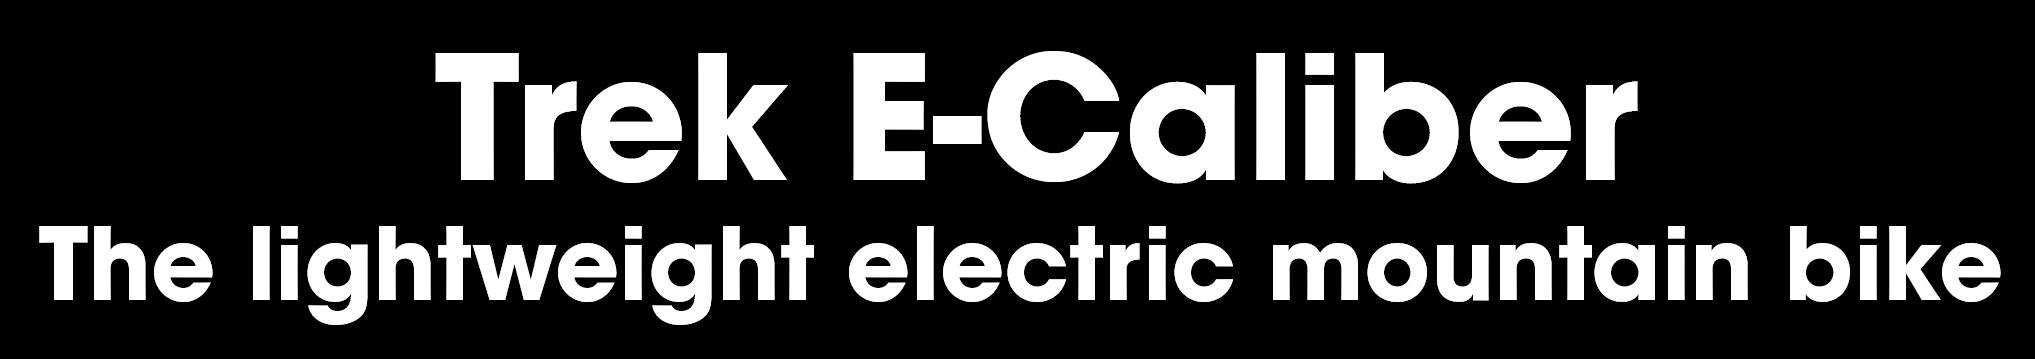 Trek ECaliber - The lightweight electric mountain bike